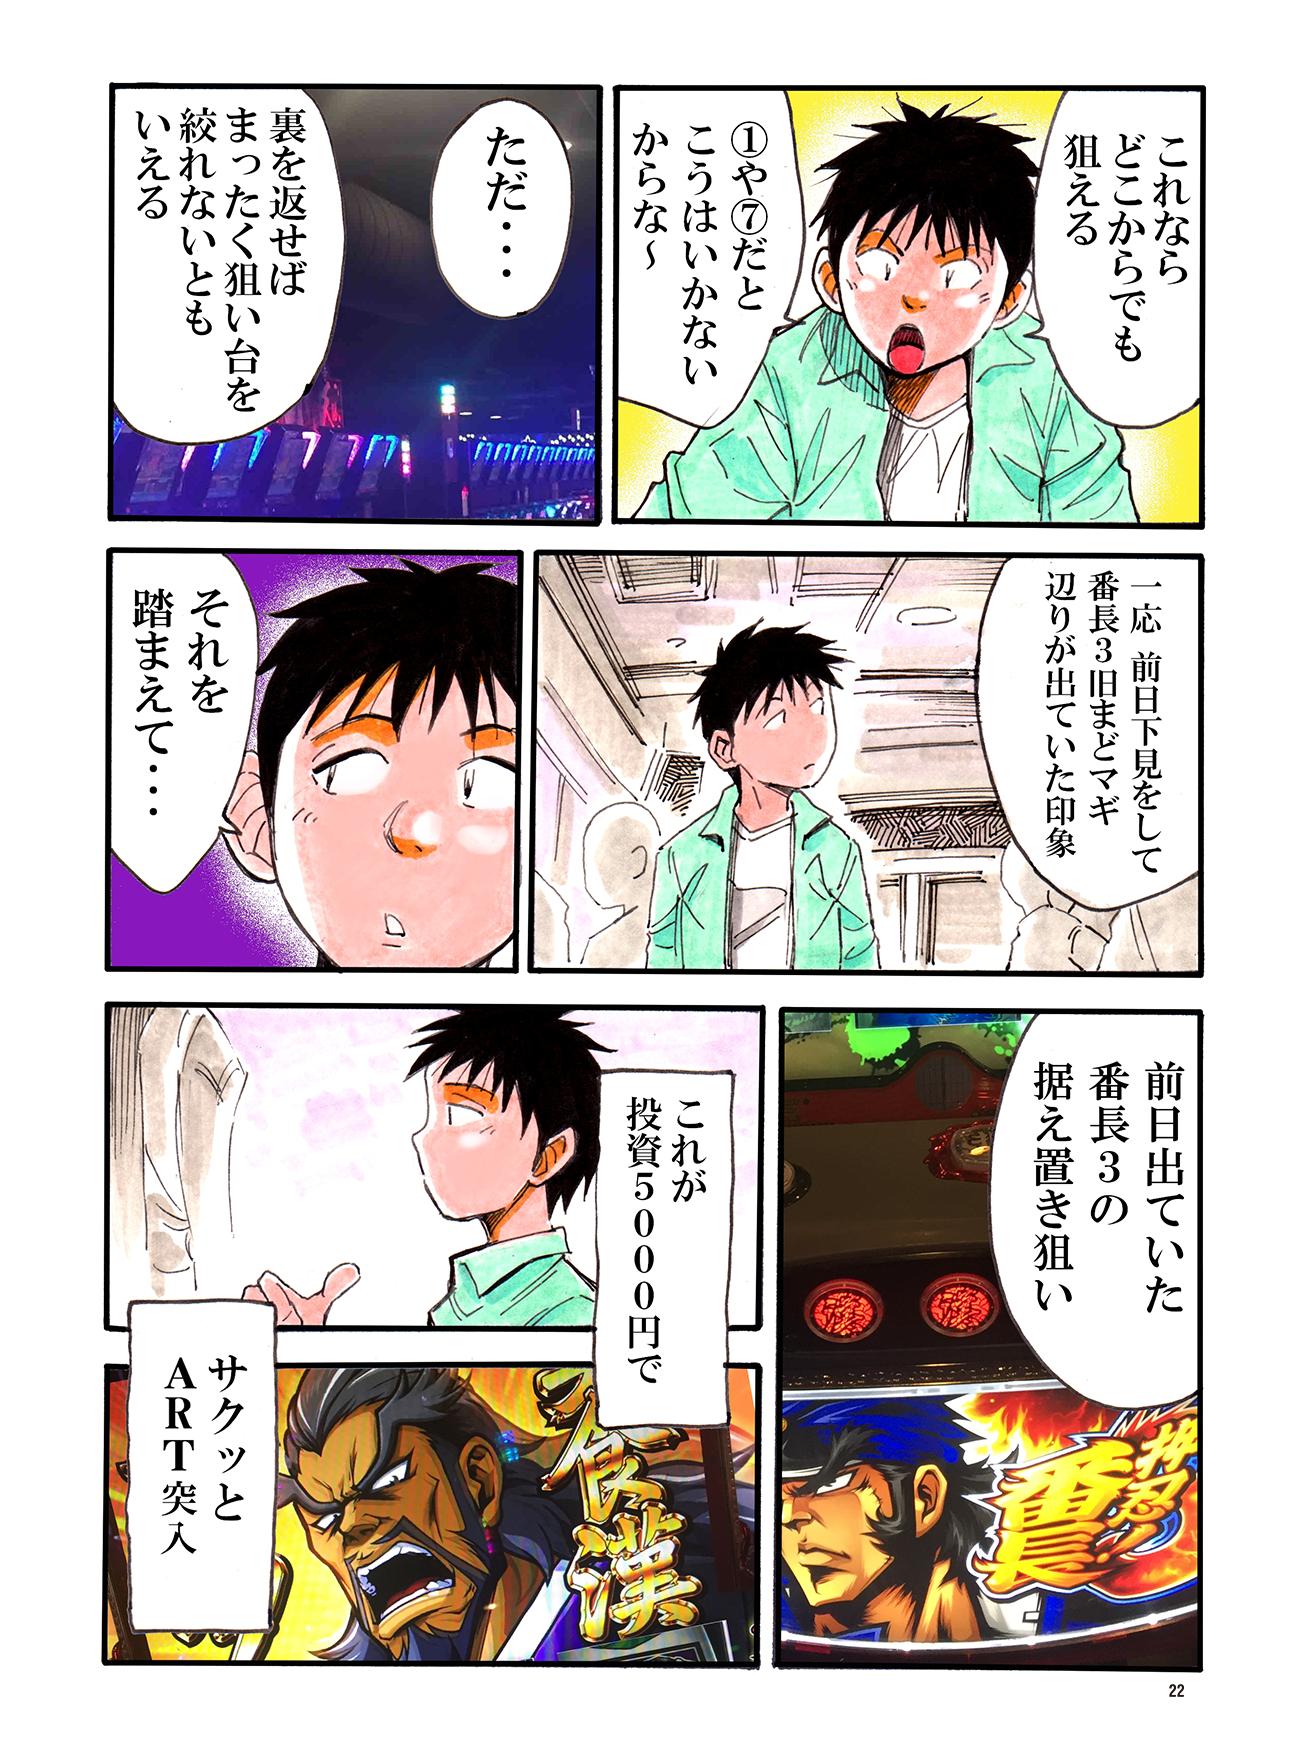 vol.4-2キング大解析